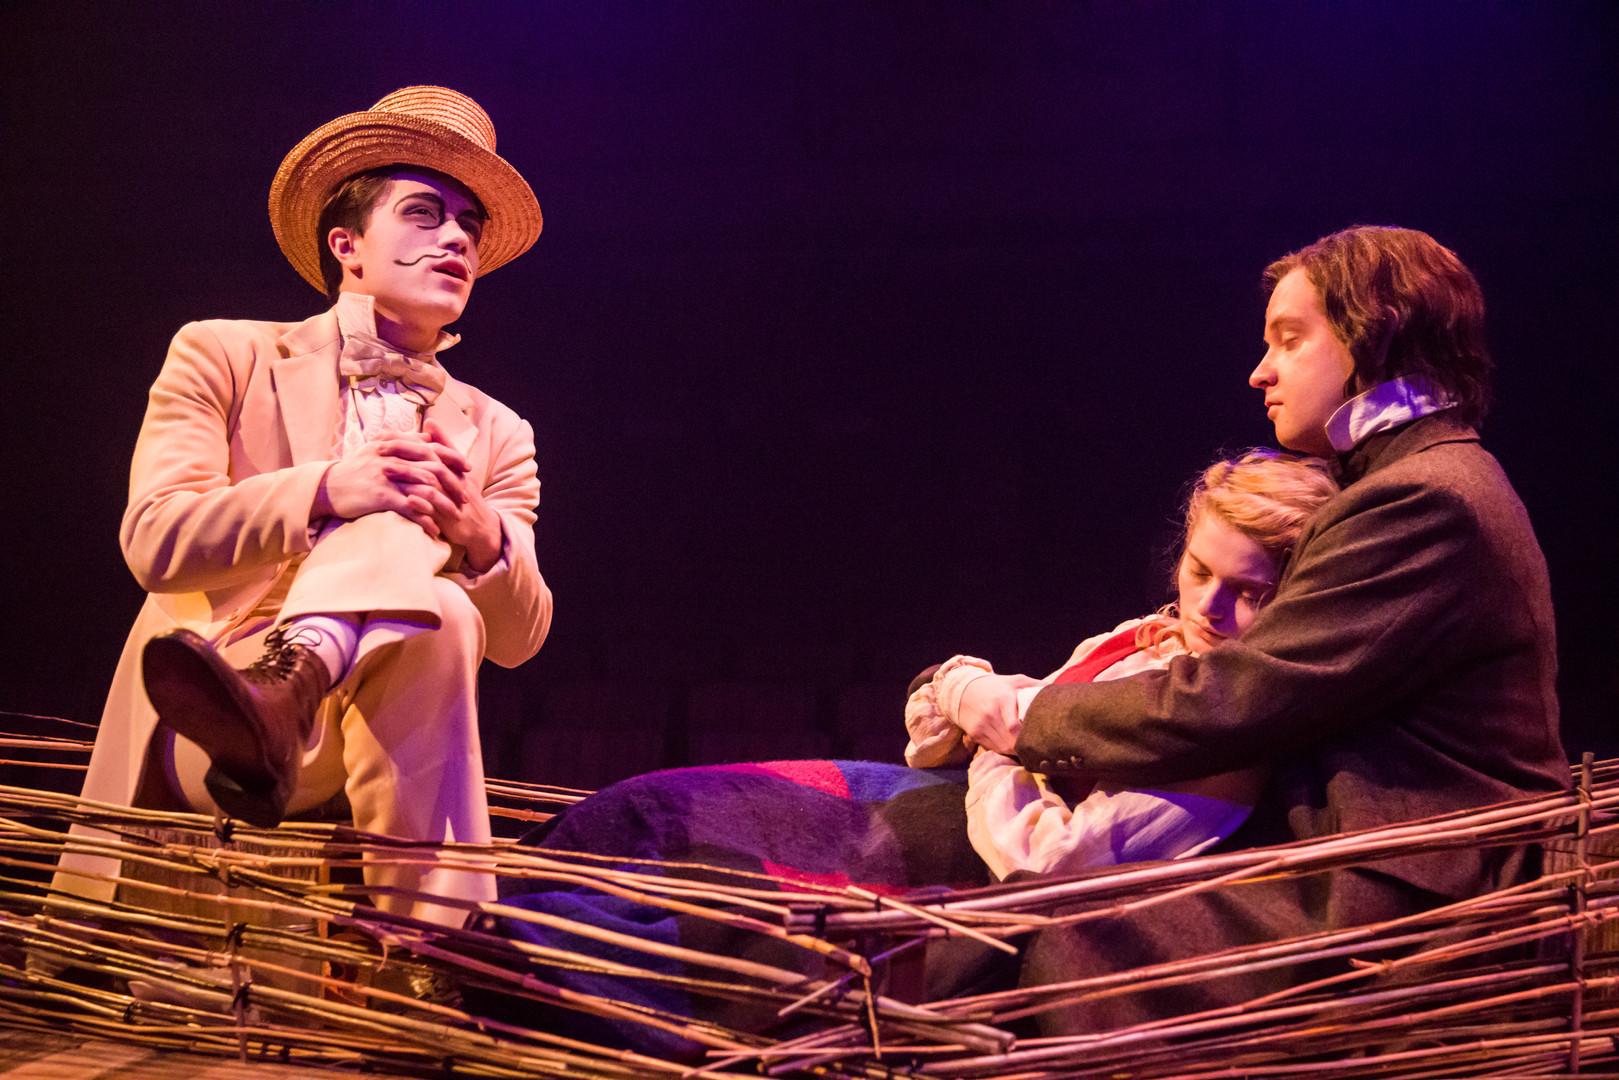 Jim Lawrenson as the White Rabbit, Eliza Shea as Alice and Luke Antony Neville as Charles Dodgson-BAM